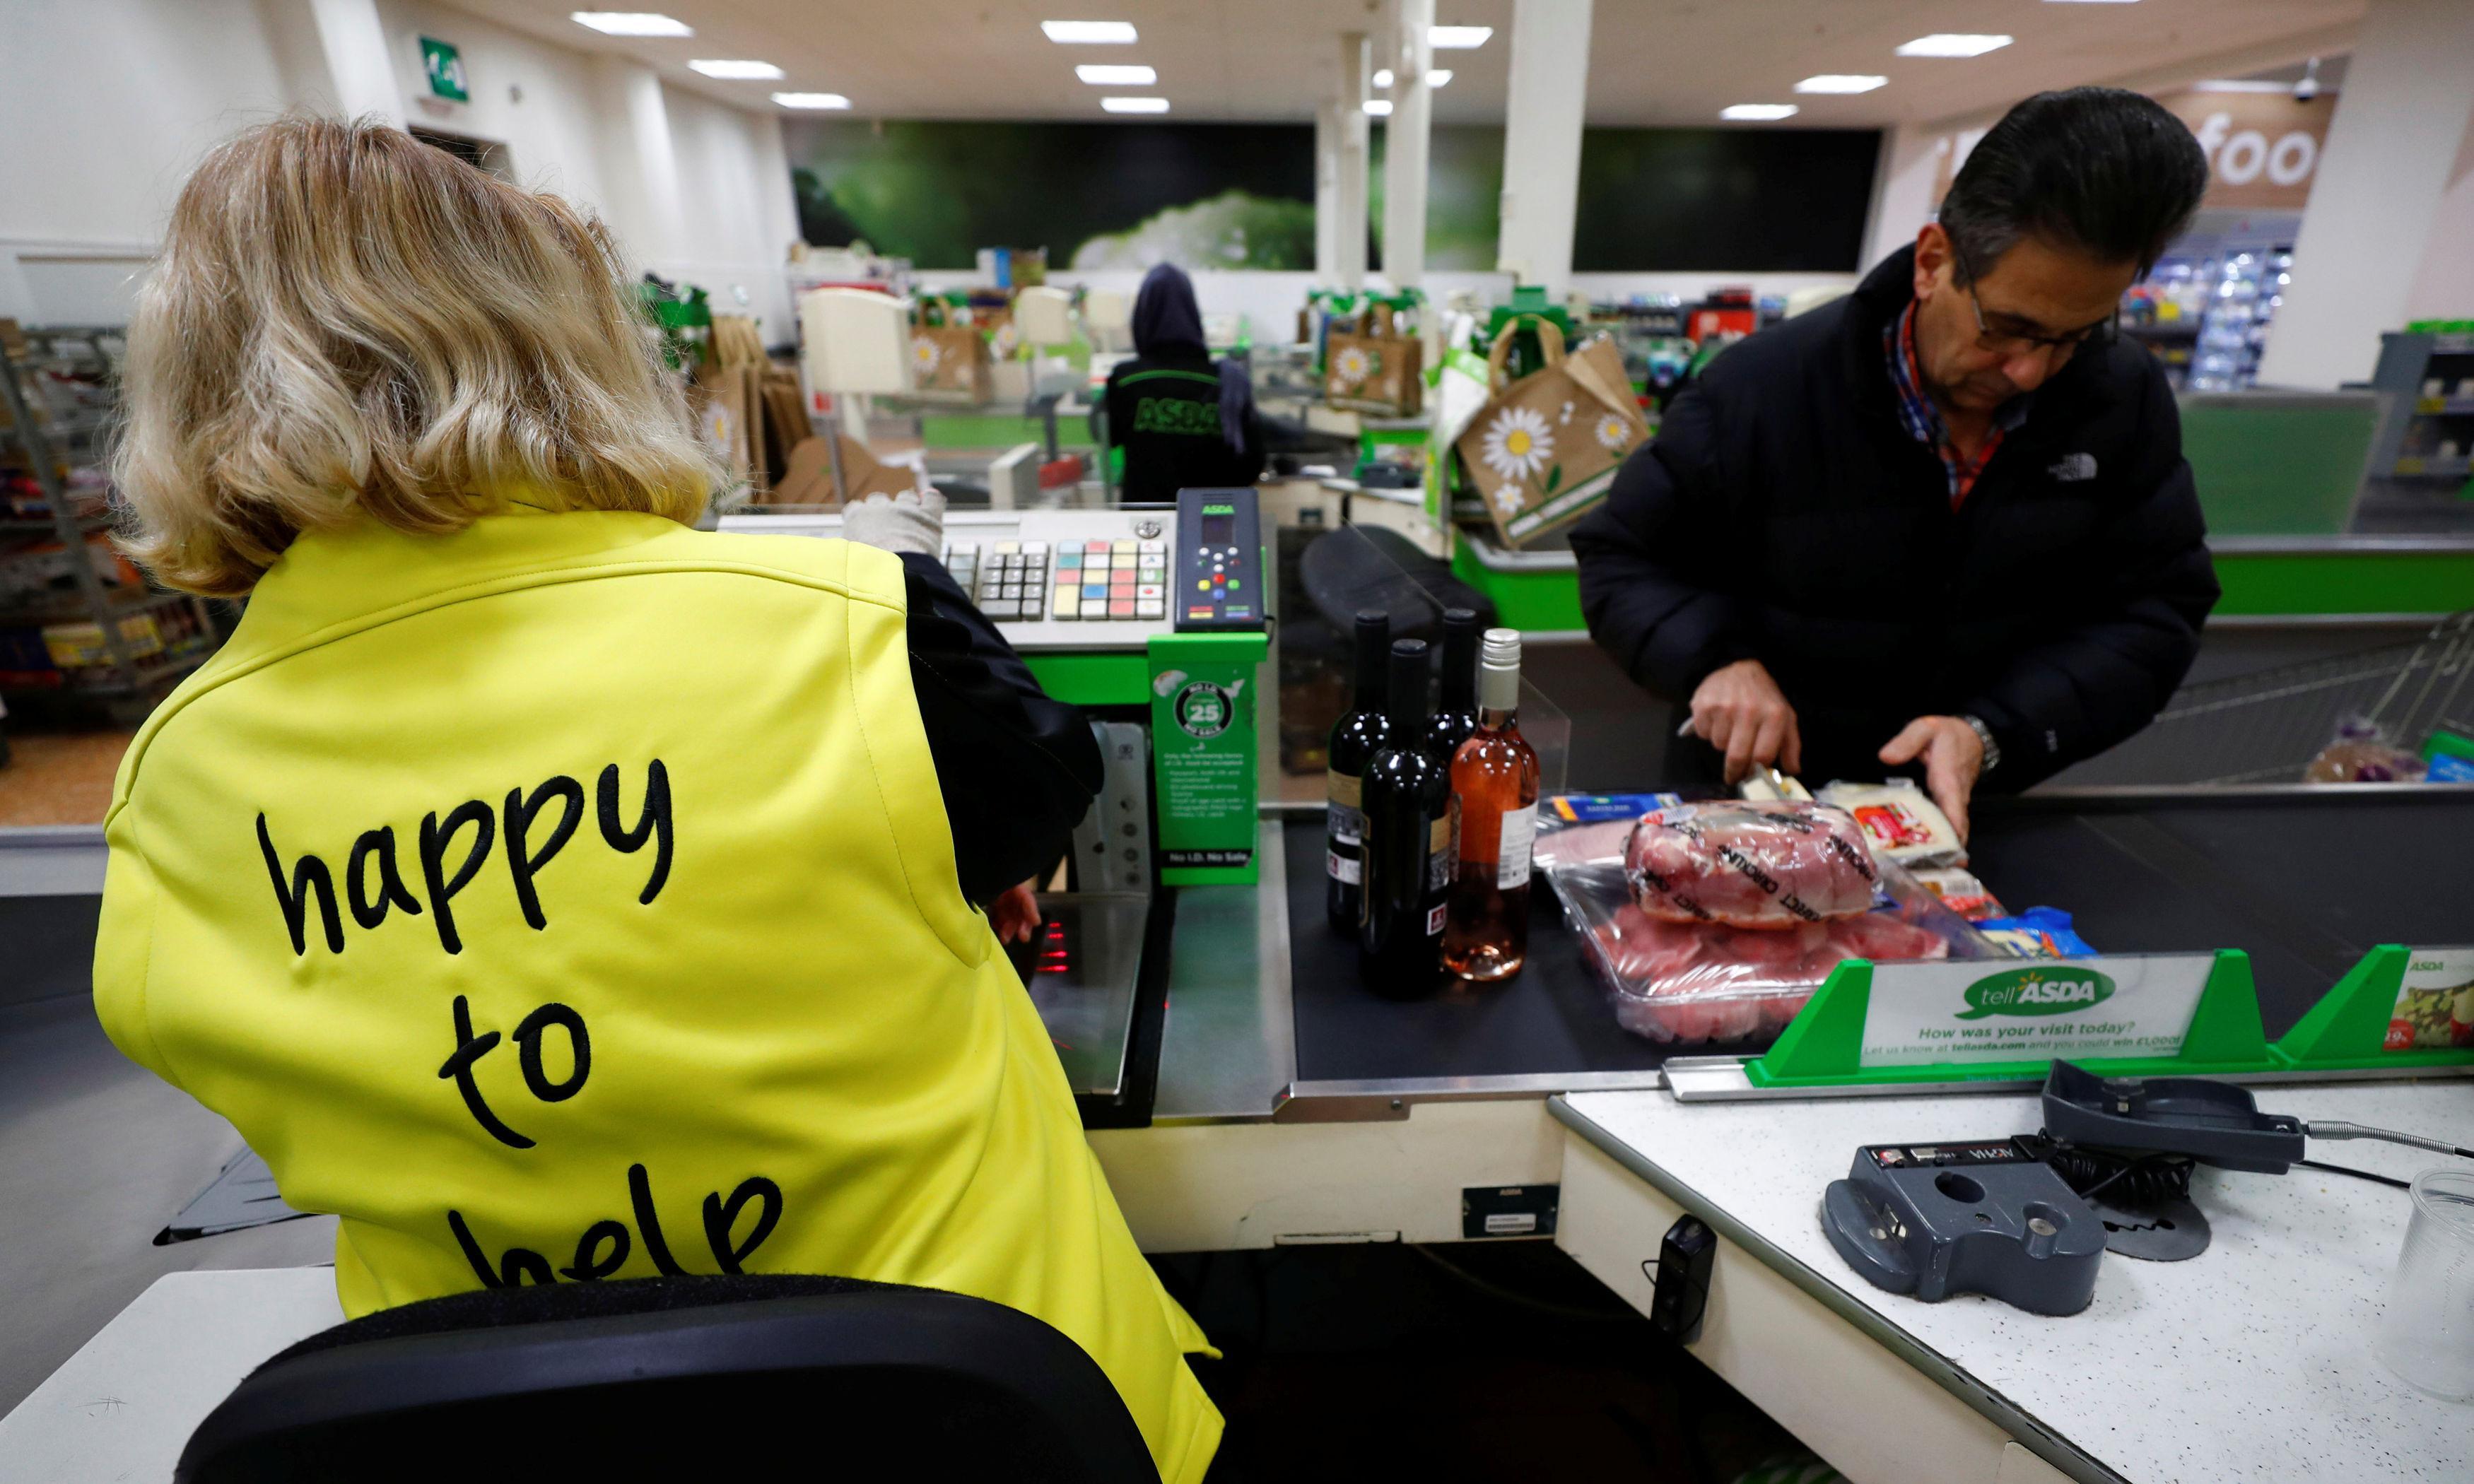 Asda's Christmas sales slide as shoppers rein in spending